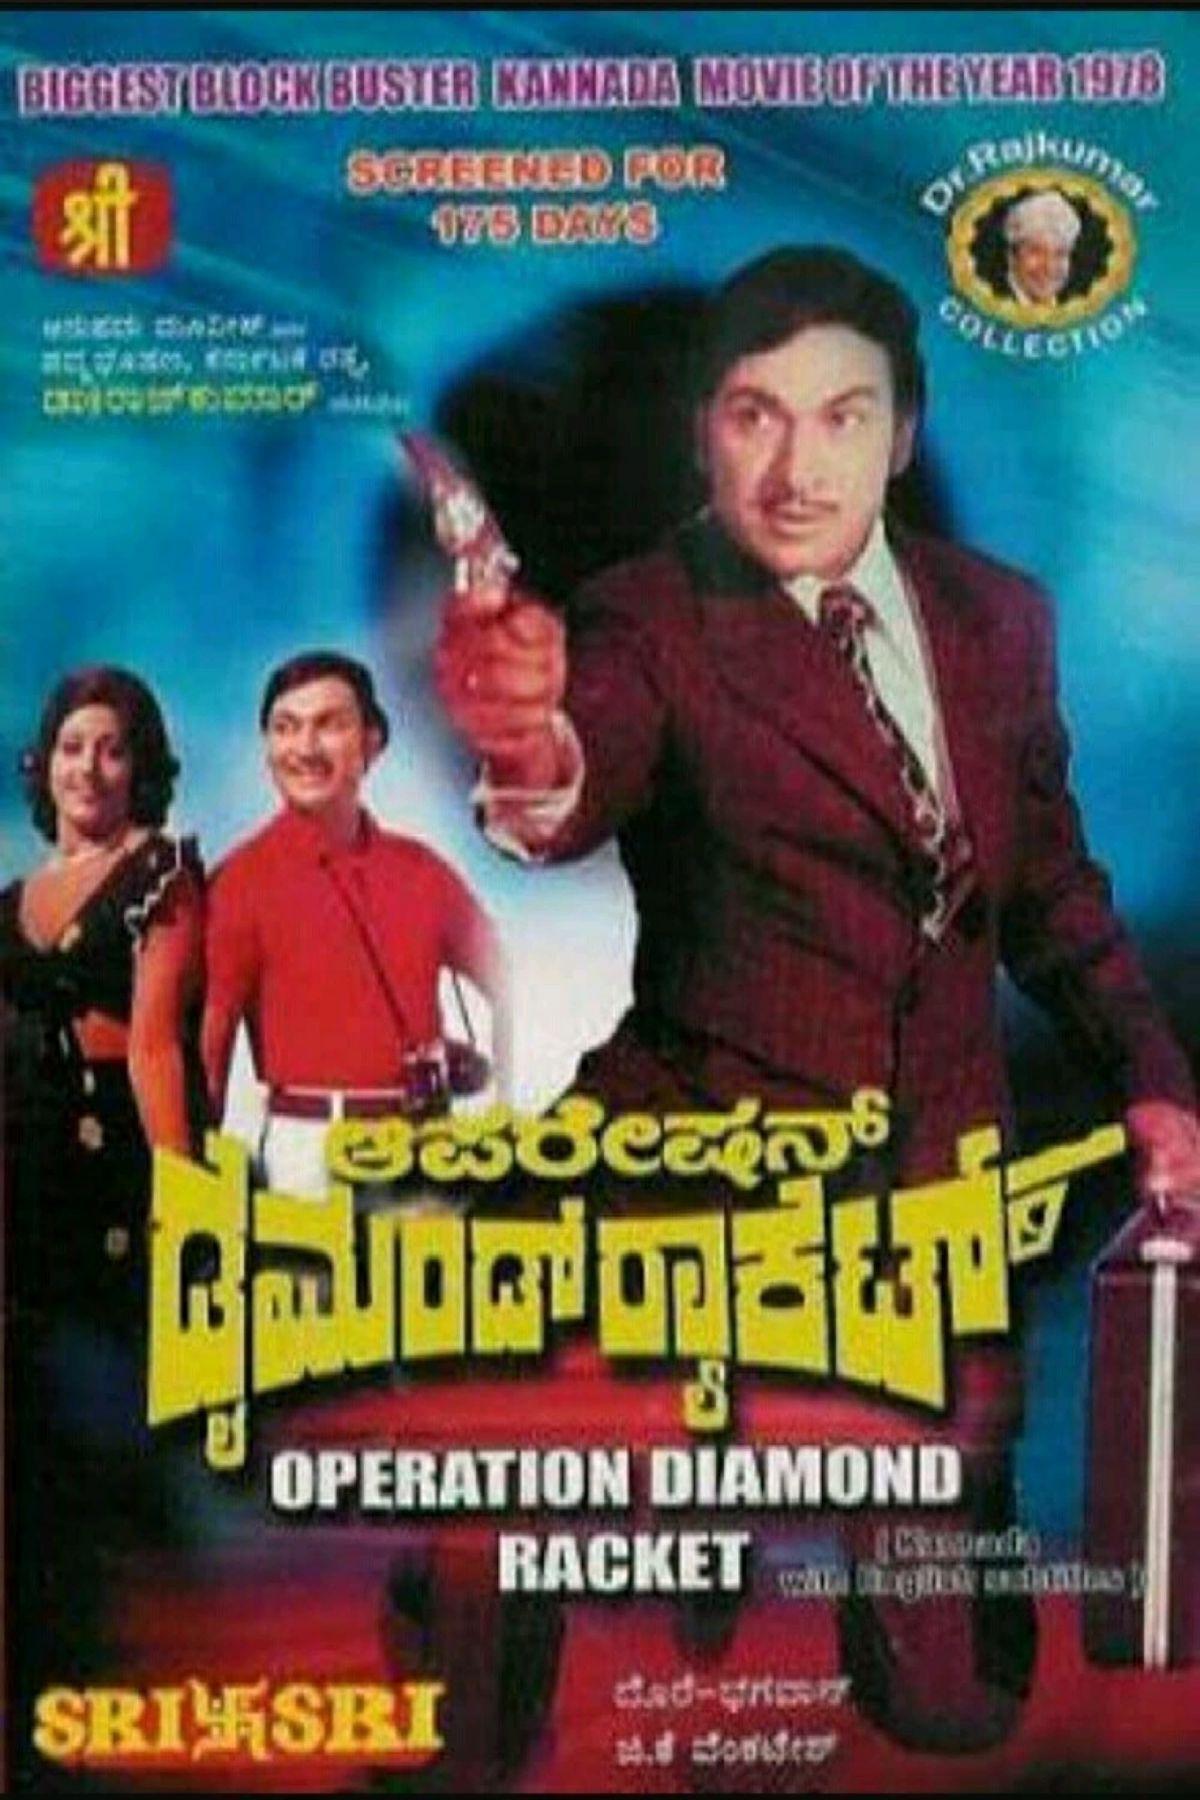 Operation Diamond Racket